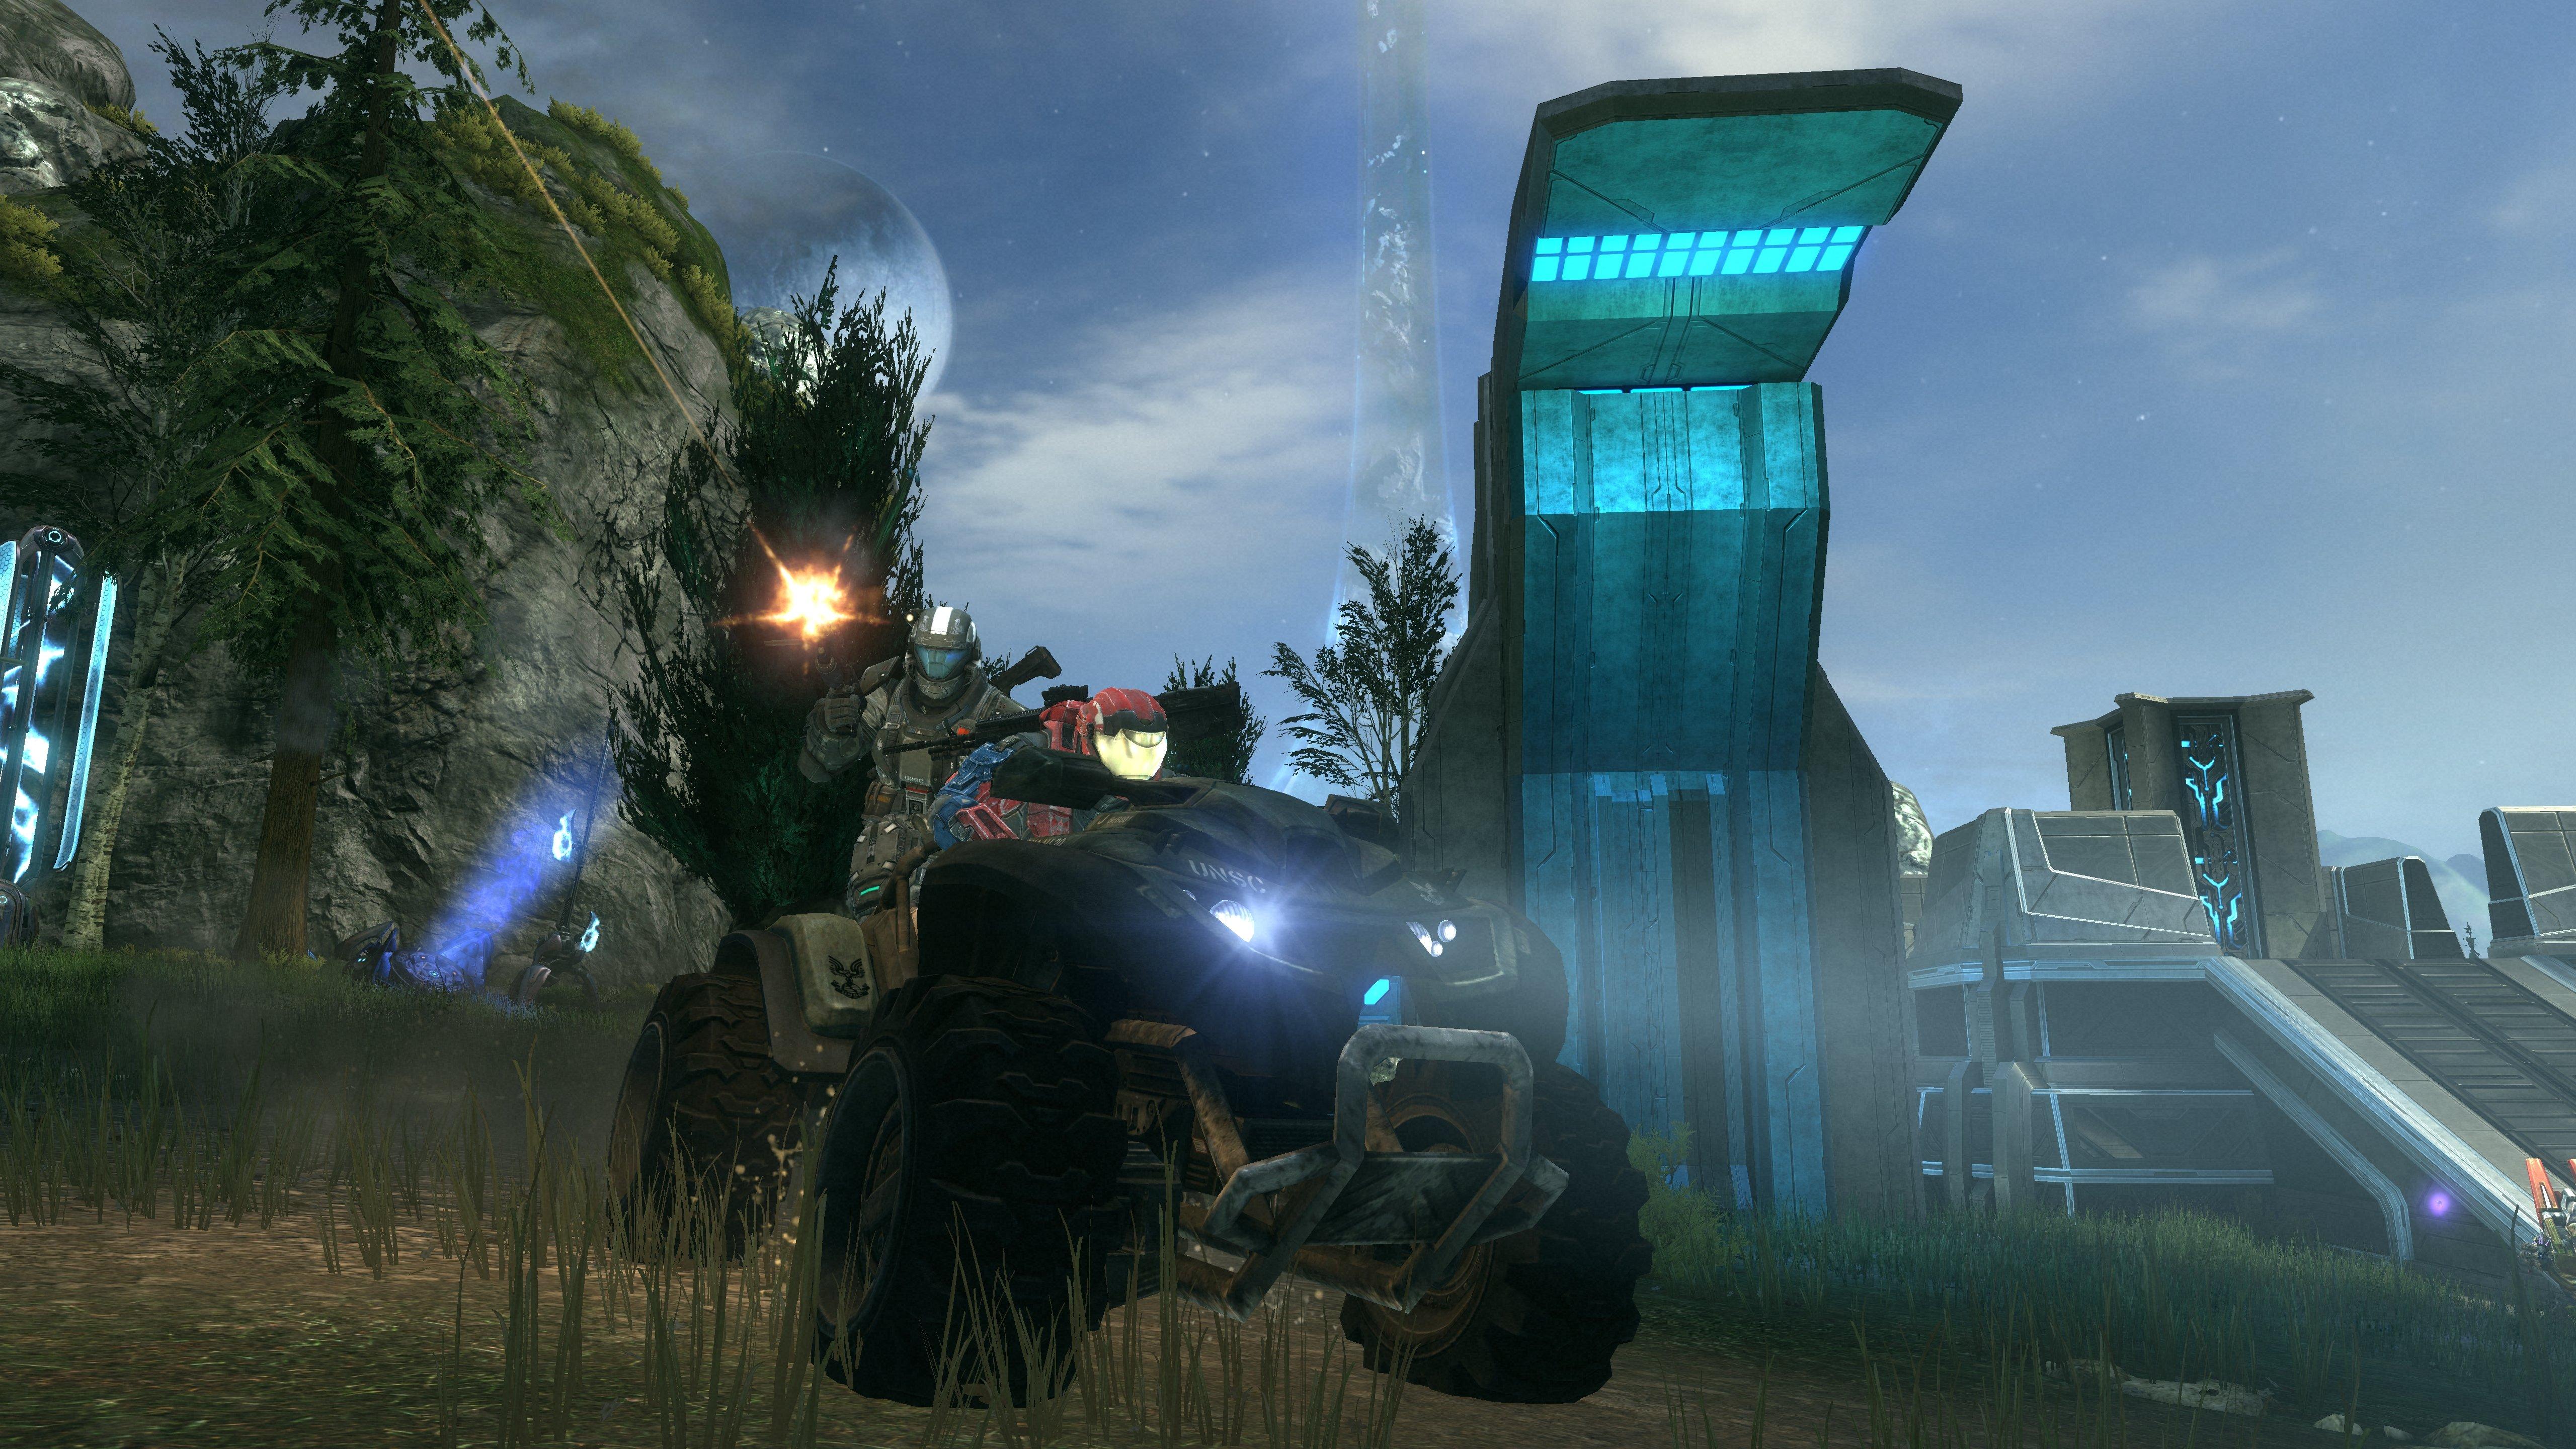 Halo: Combat Evolved Anniversary - Halo: Combat Evolved Anniversary 5K